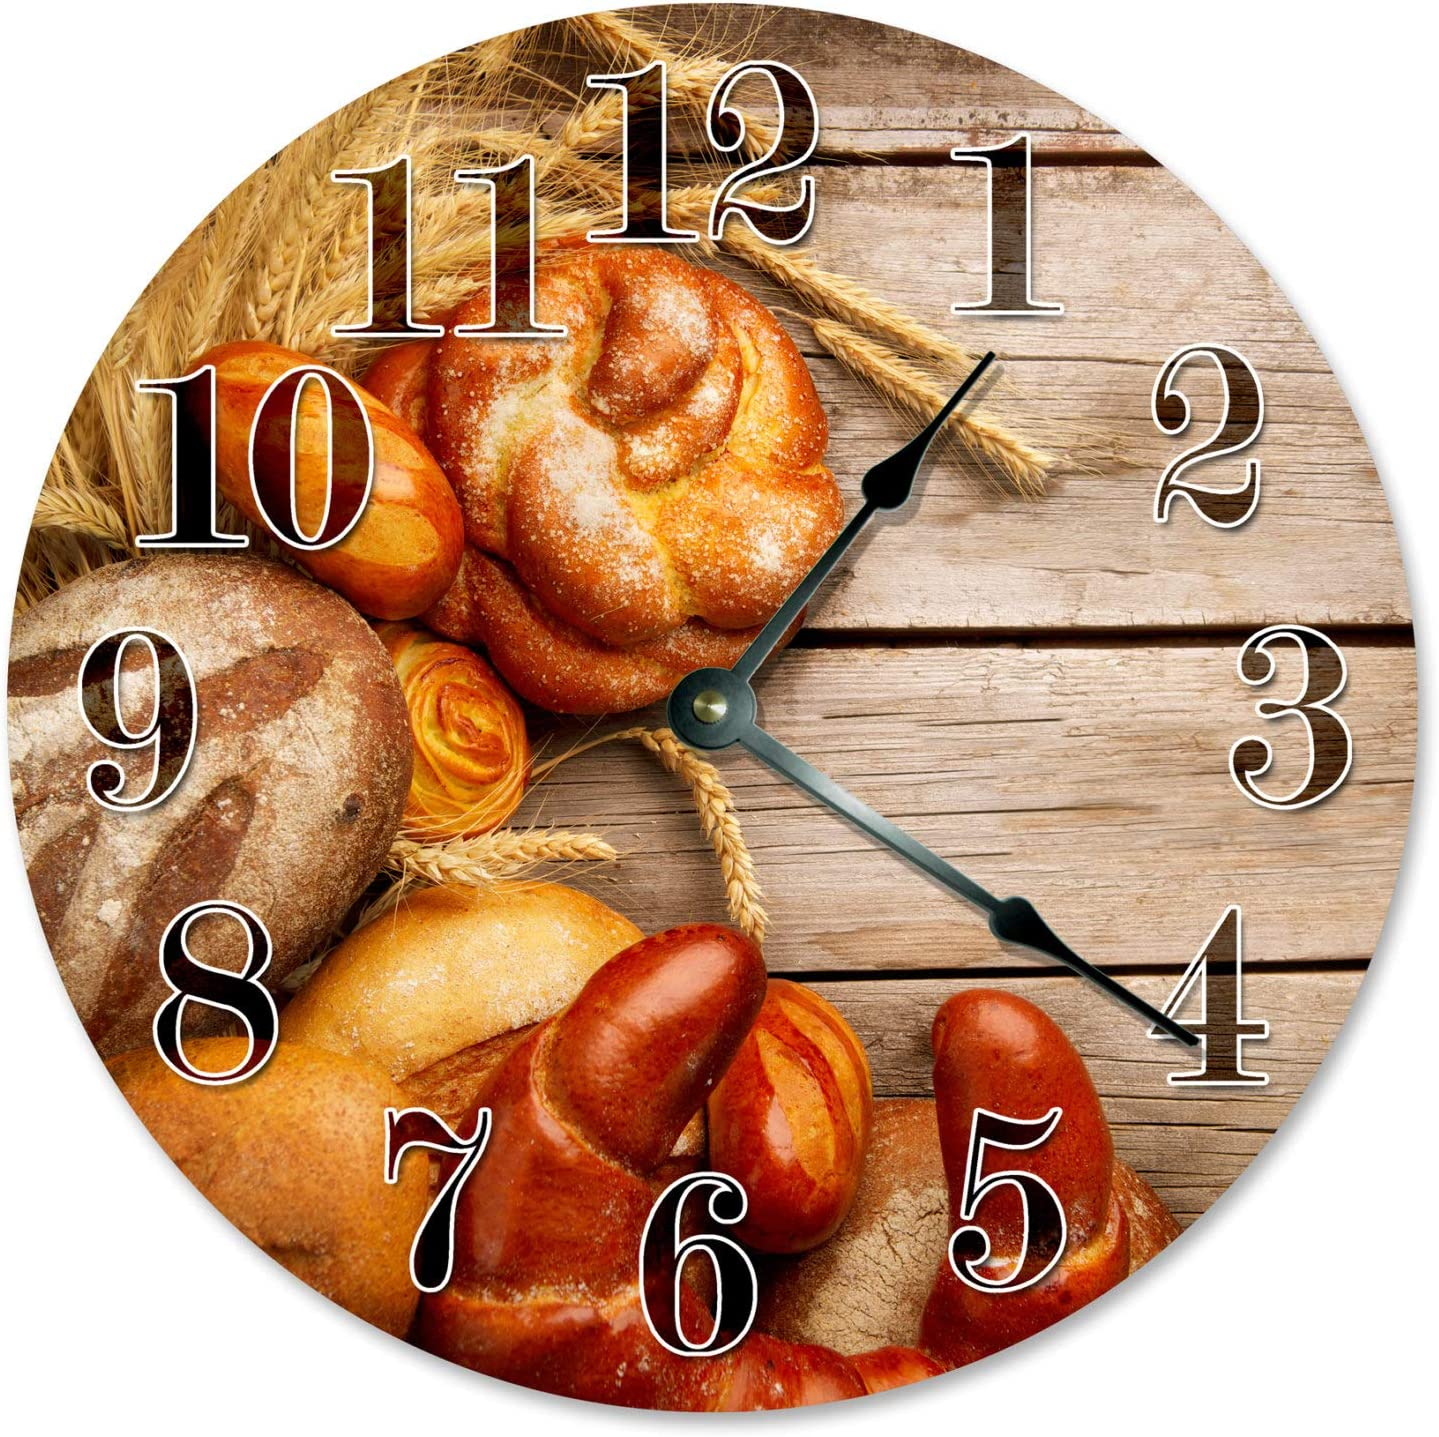 8Jo6Poe Bread Wheat and Wood Clock Large 12 inch Clock Novelty Clocks Wall Clocks Round Clock, Food Clock, Kitchen Clock - 2168